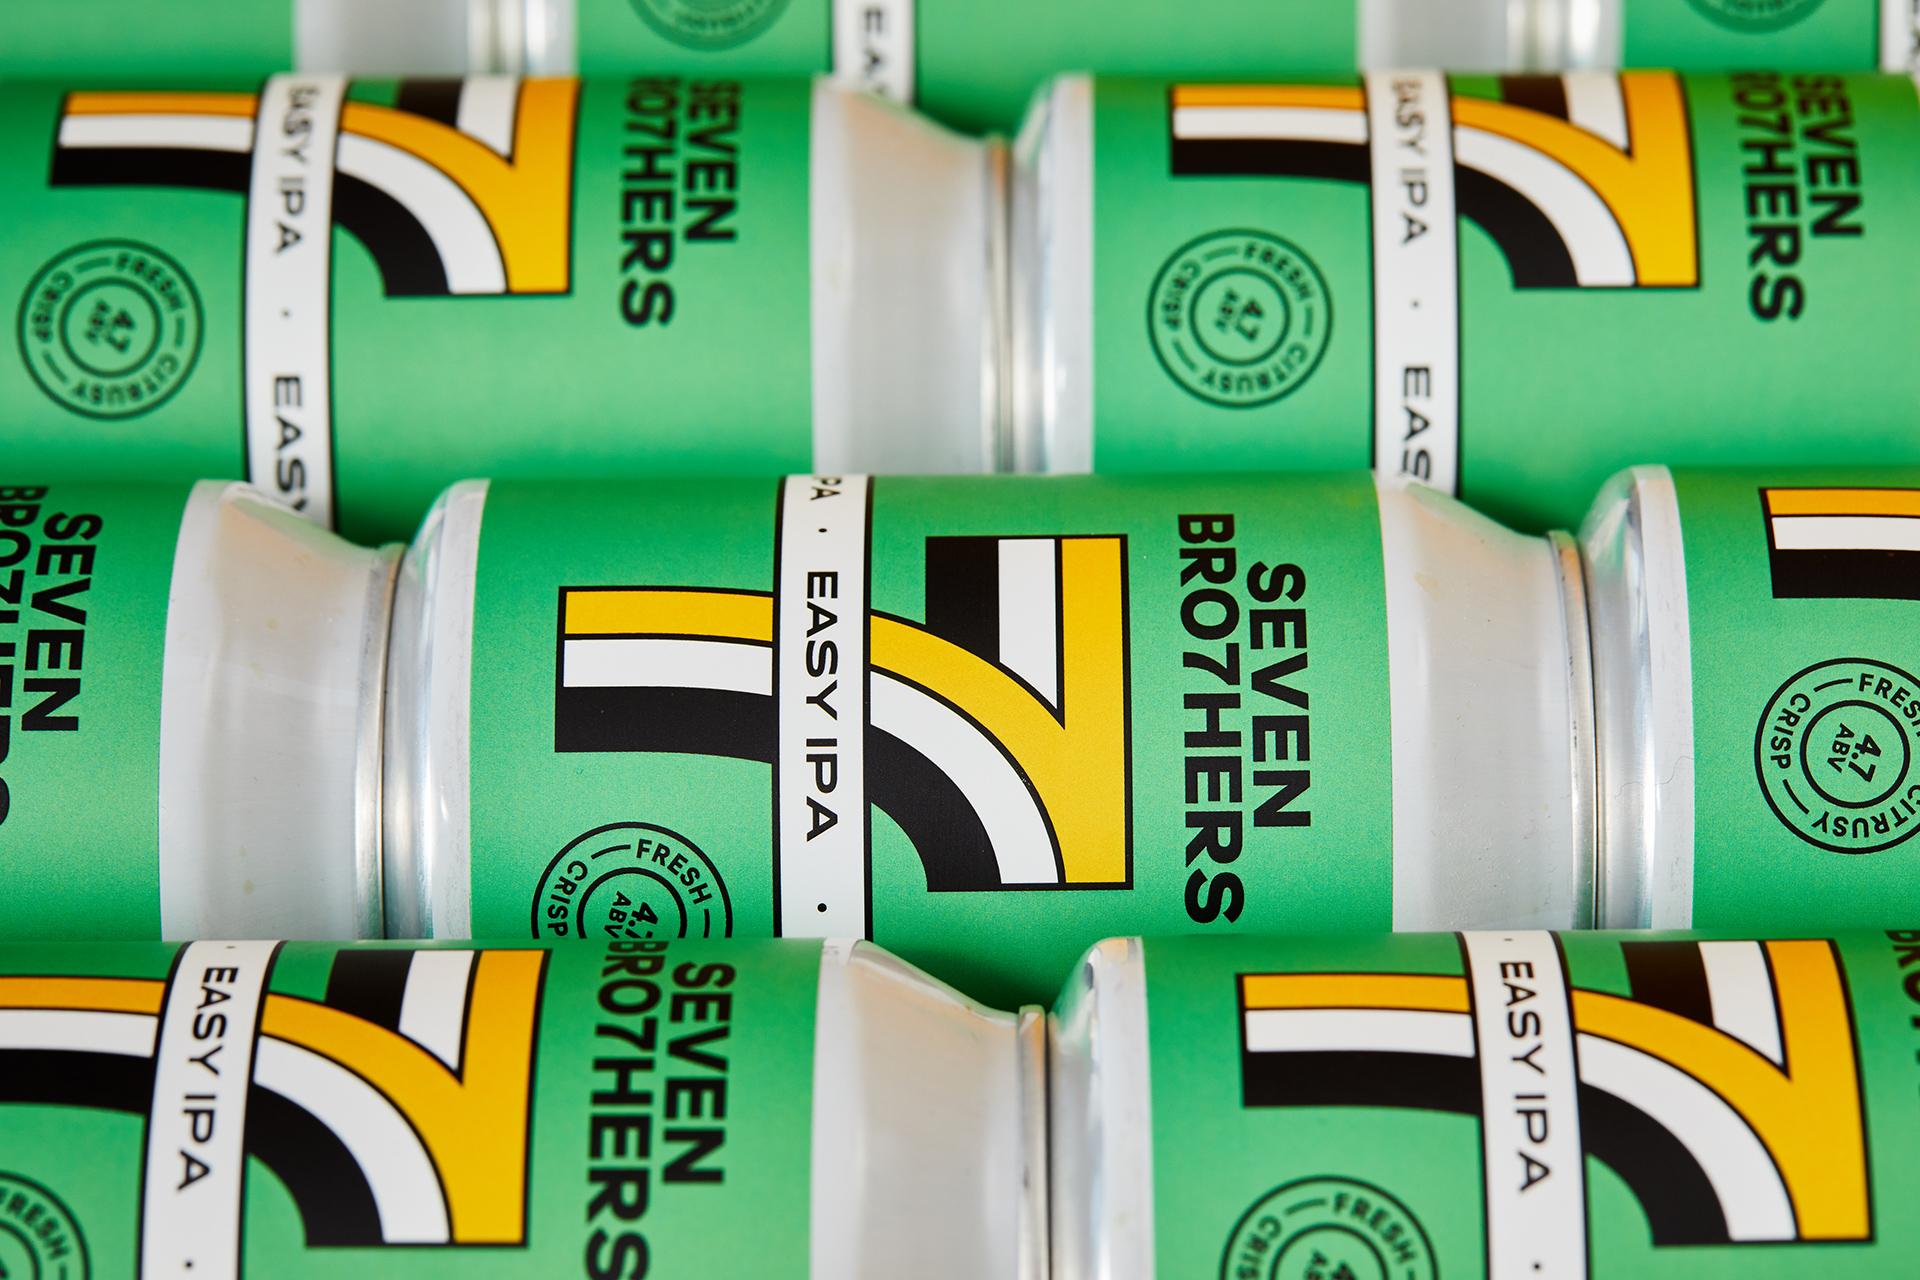 Seven Brothers beer brand update